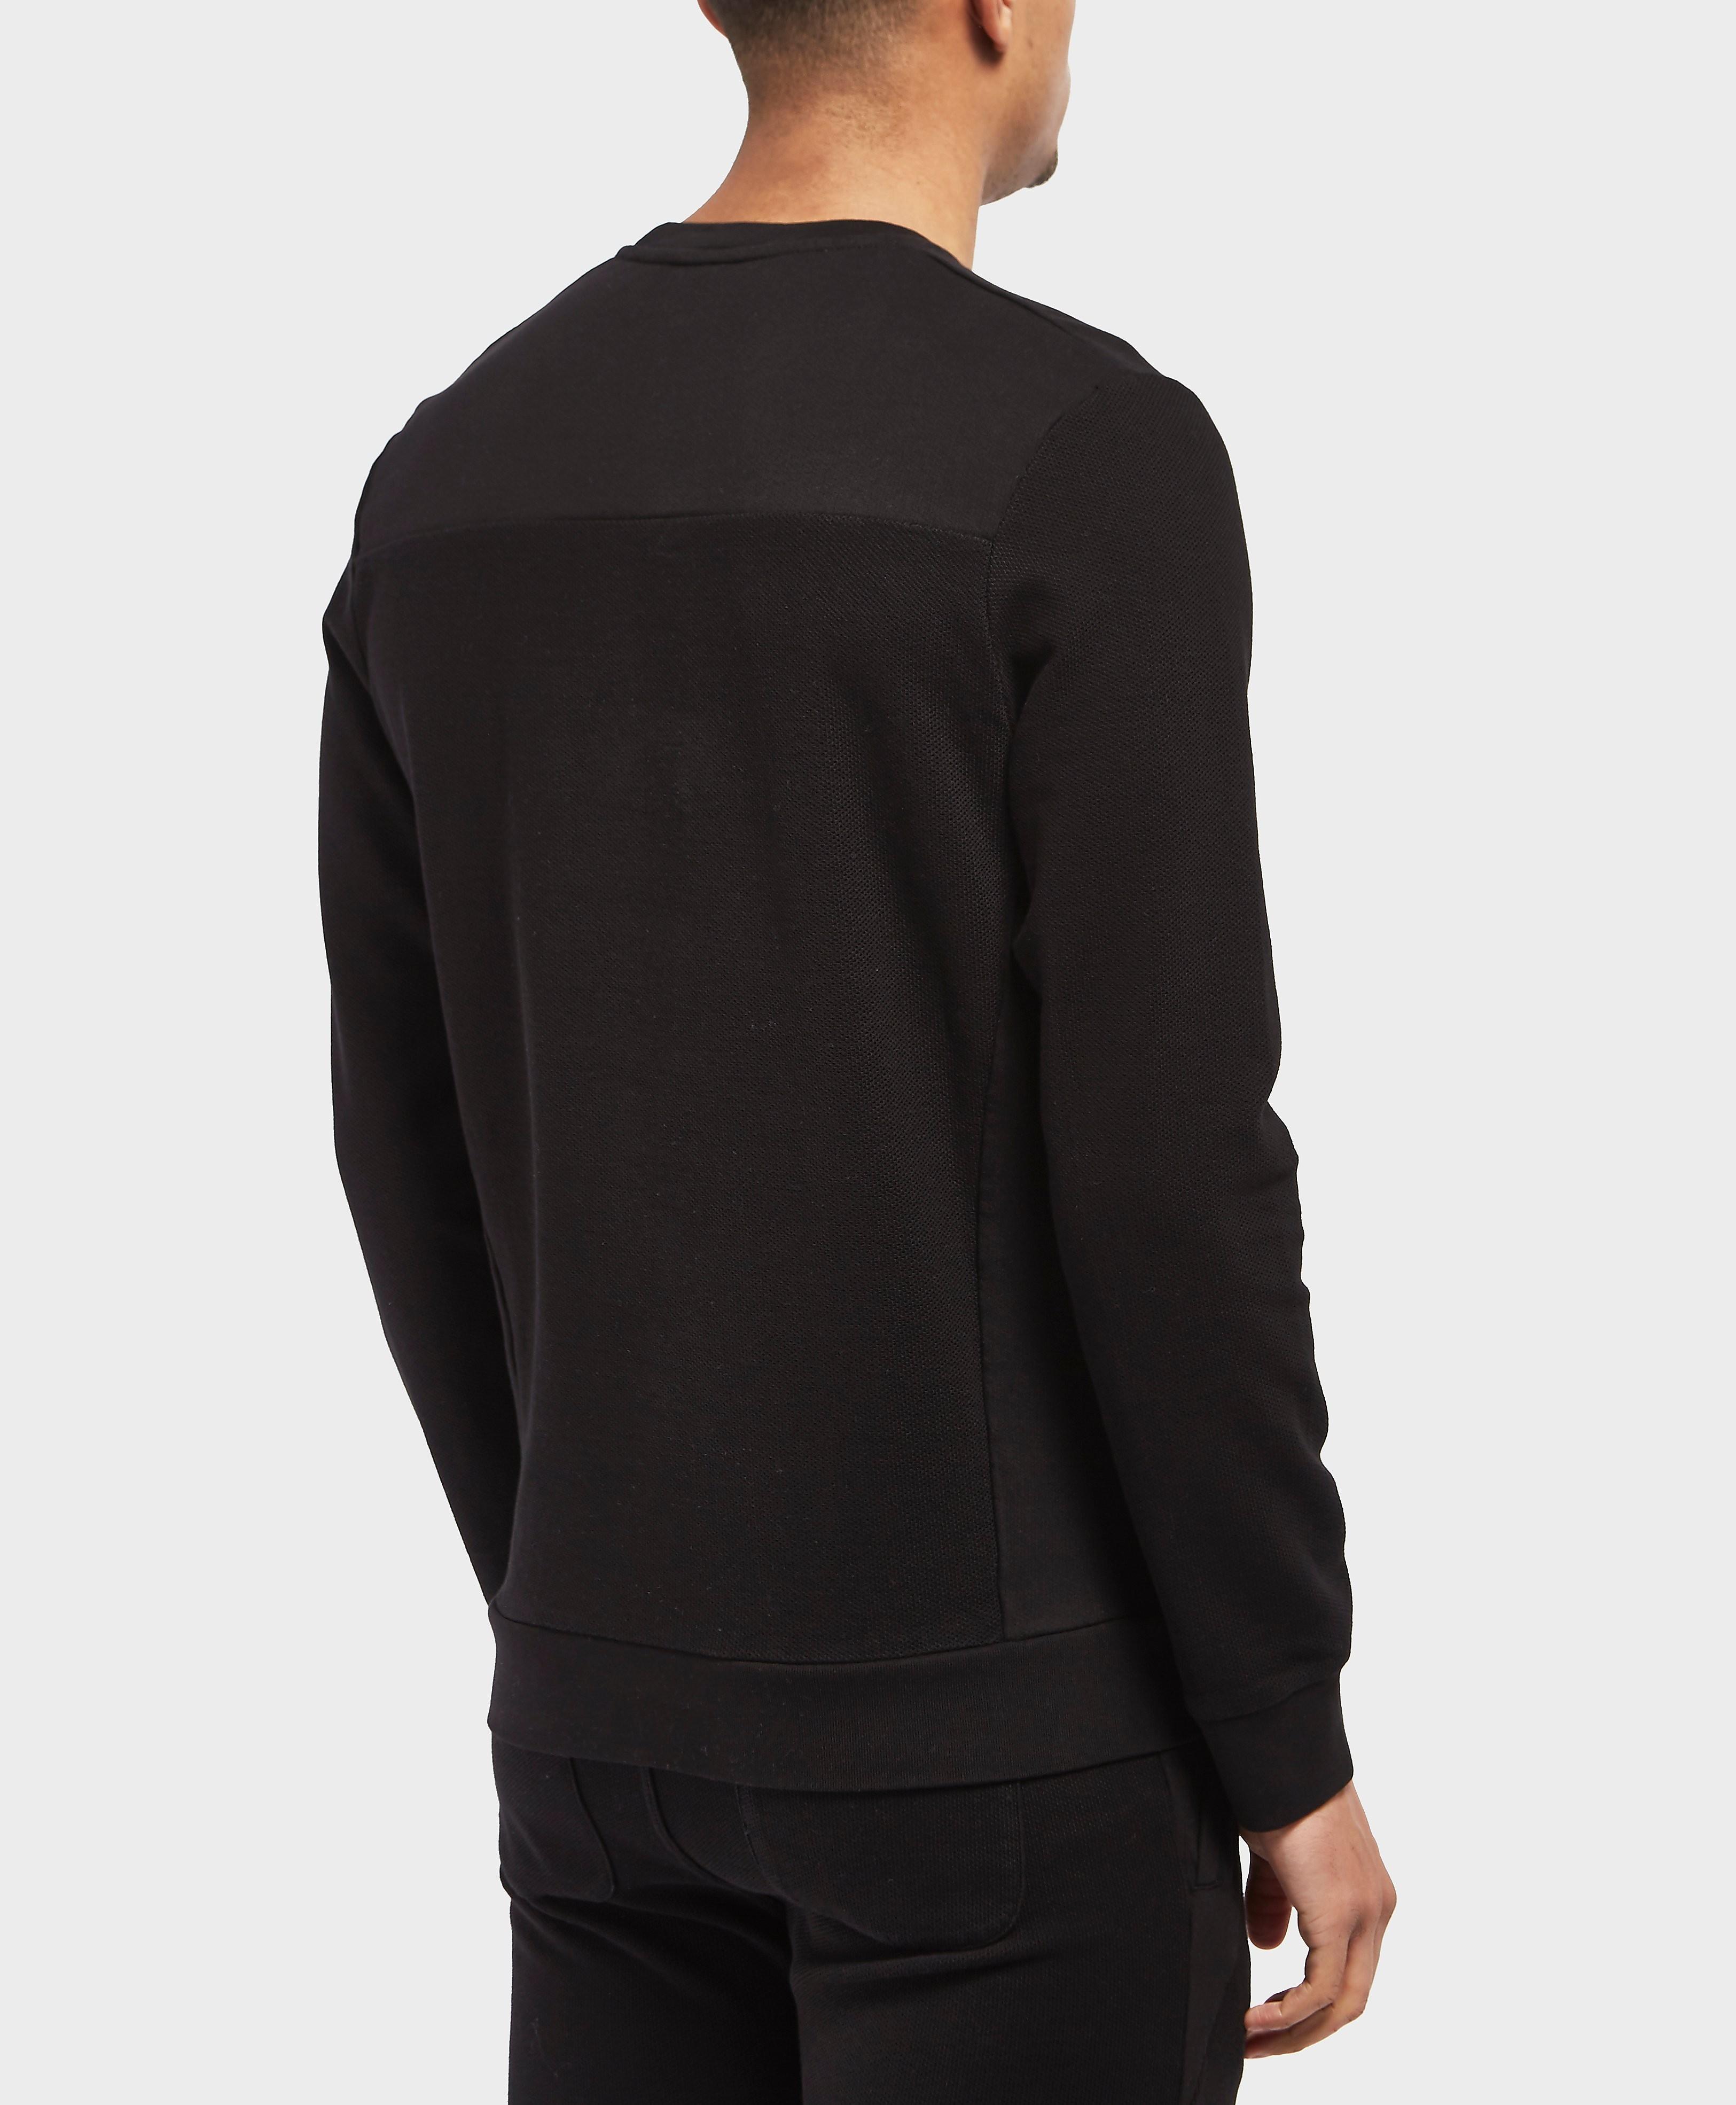 Pyrenex Hubert Crew Sweatshirt